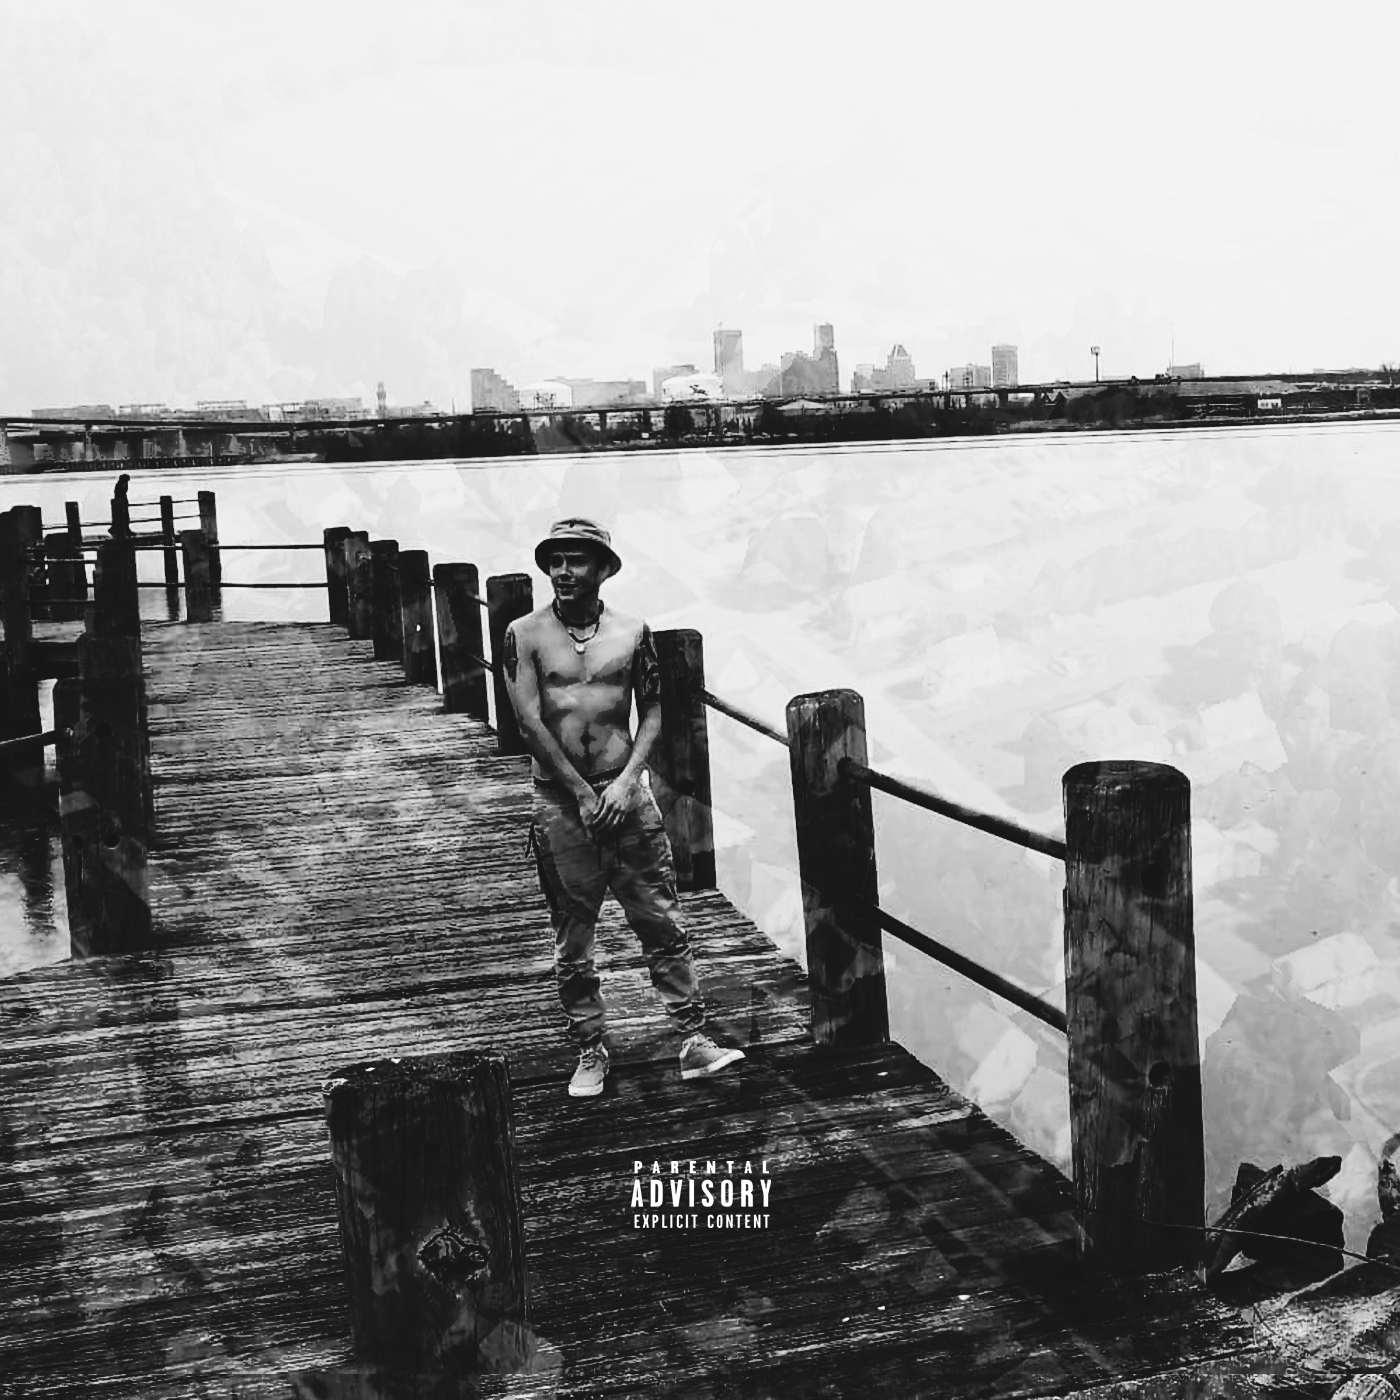 Mixtape, Album Cover Flyer Design for $2